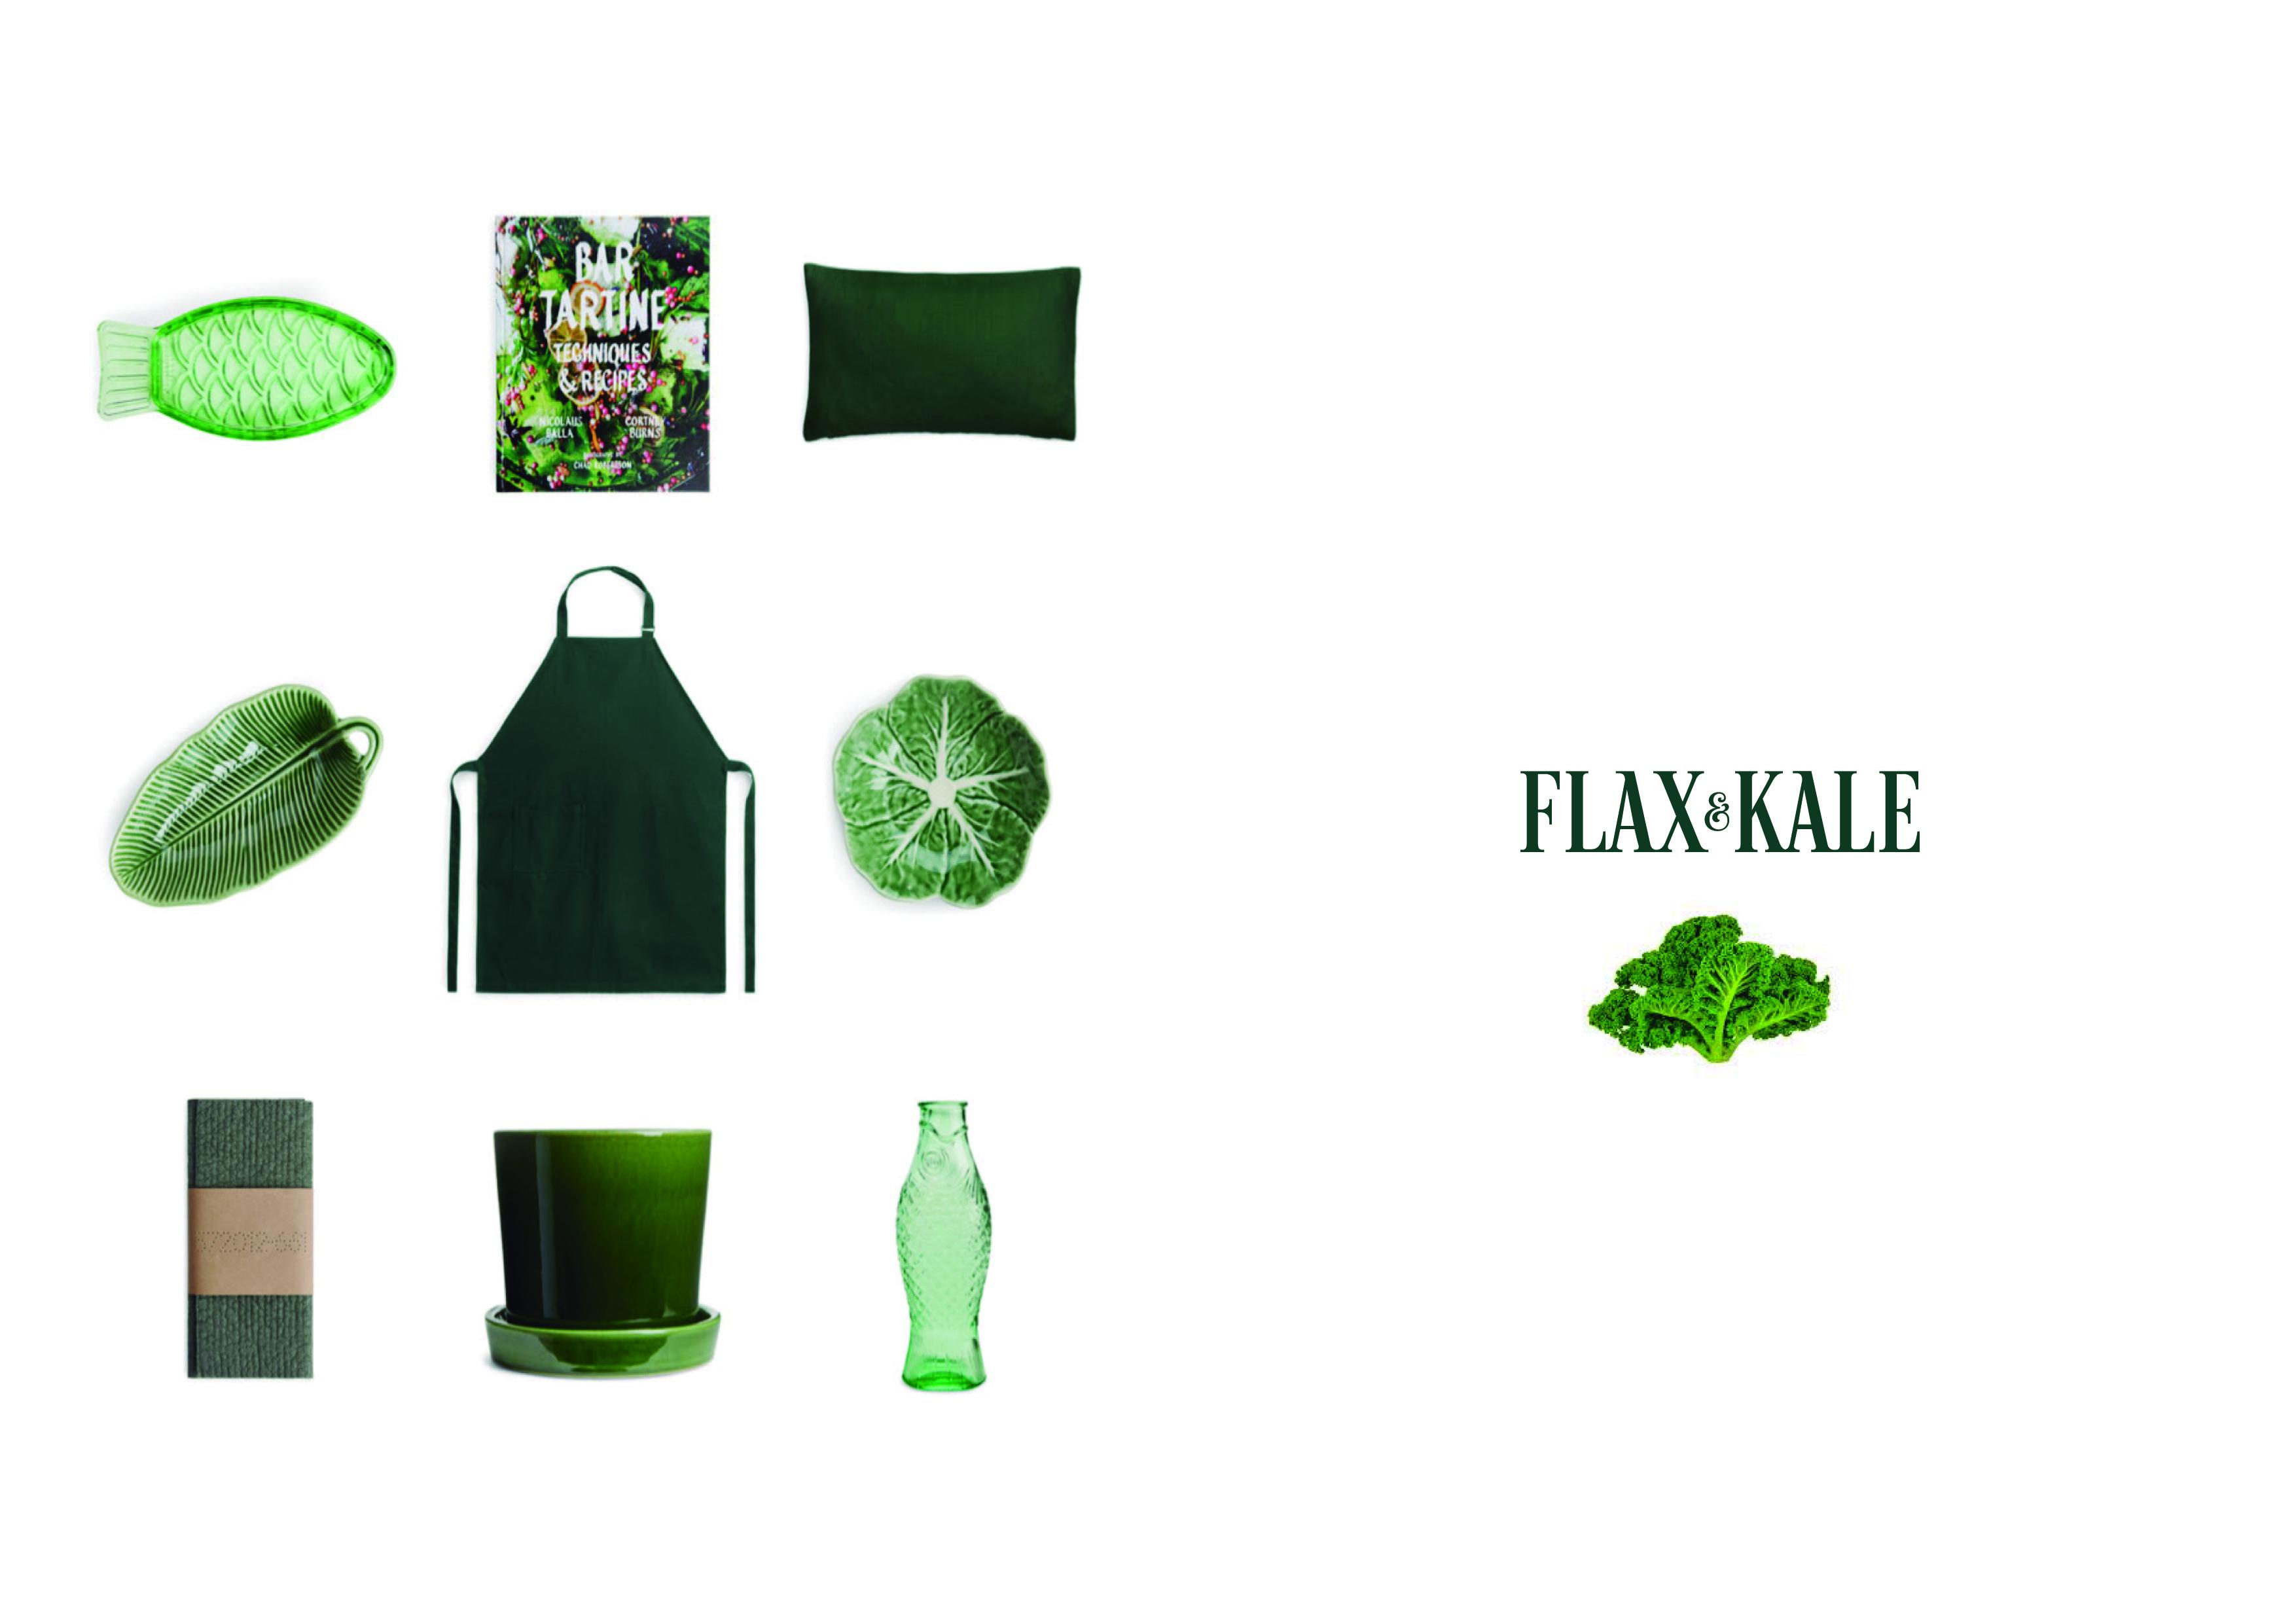 FLAX&KALE FINAL-03